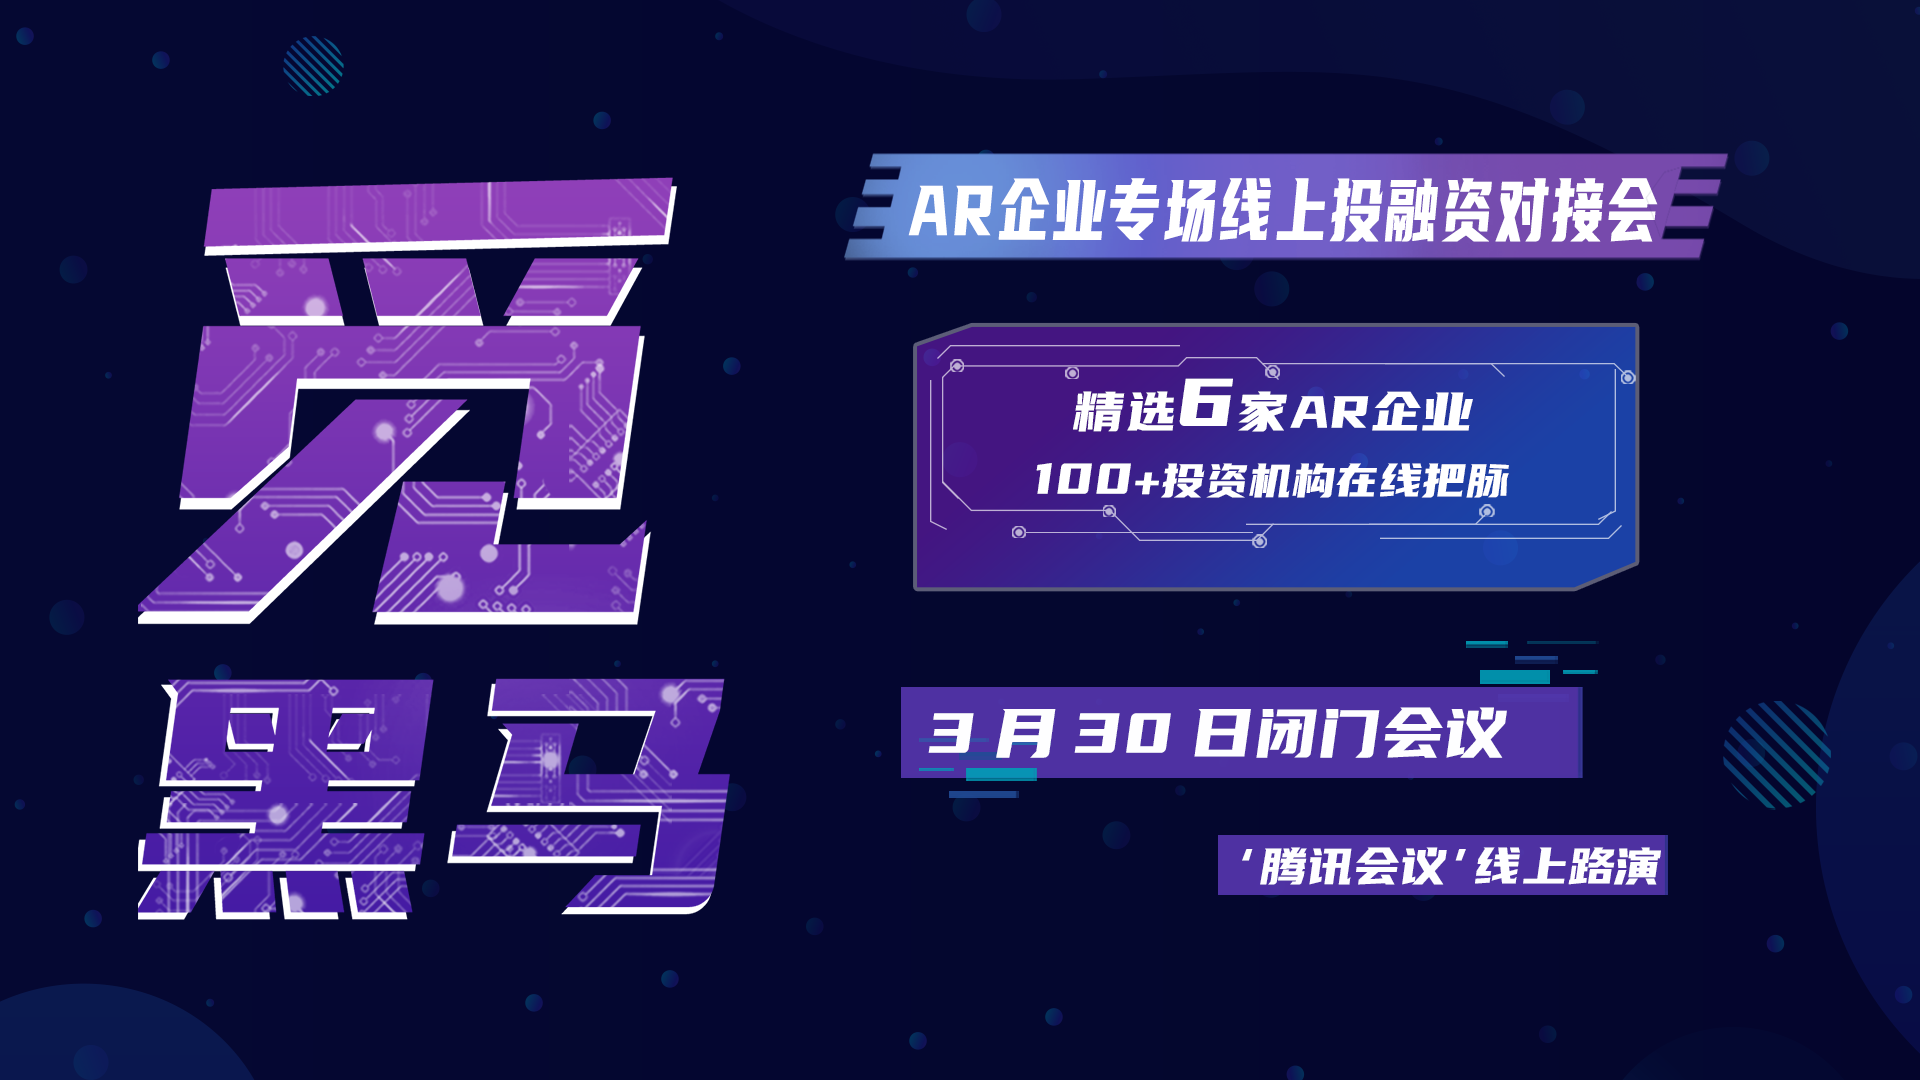 AR专场丨VR陀螺第三届觅黑马·VR/AR线上投融资对接会正式启动